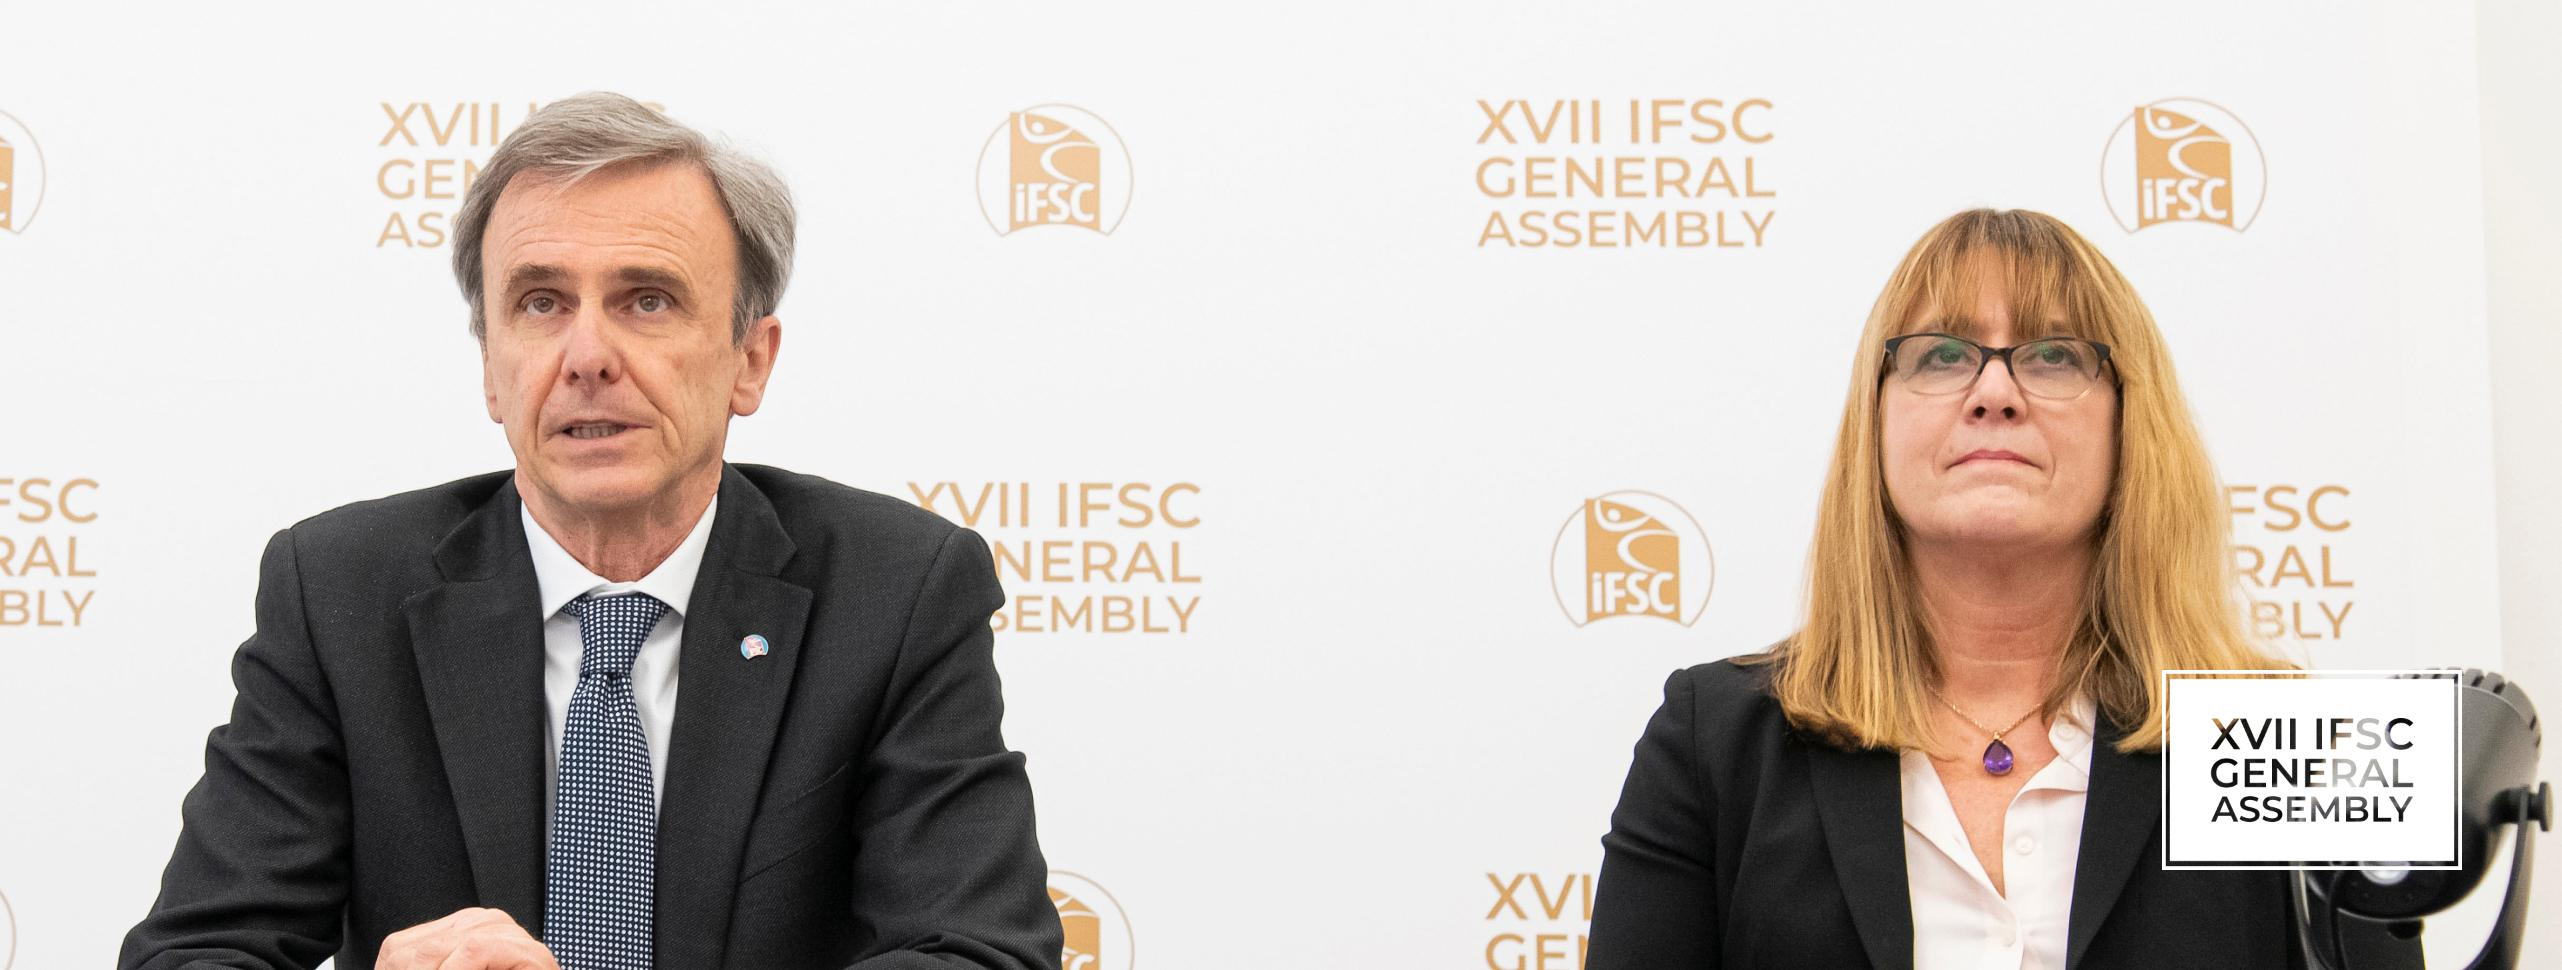 MARCO SCOLARIS AND DEBRA GAWRYCH TO LEAD IFSC UNTIL 2025